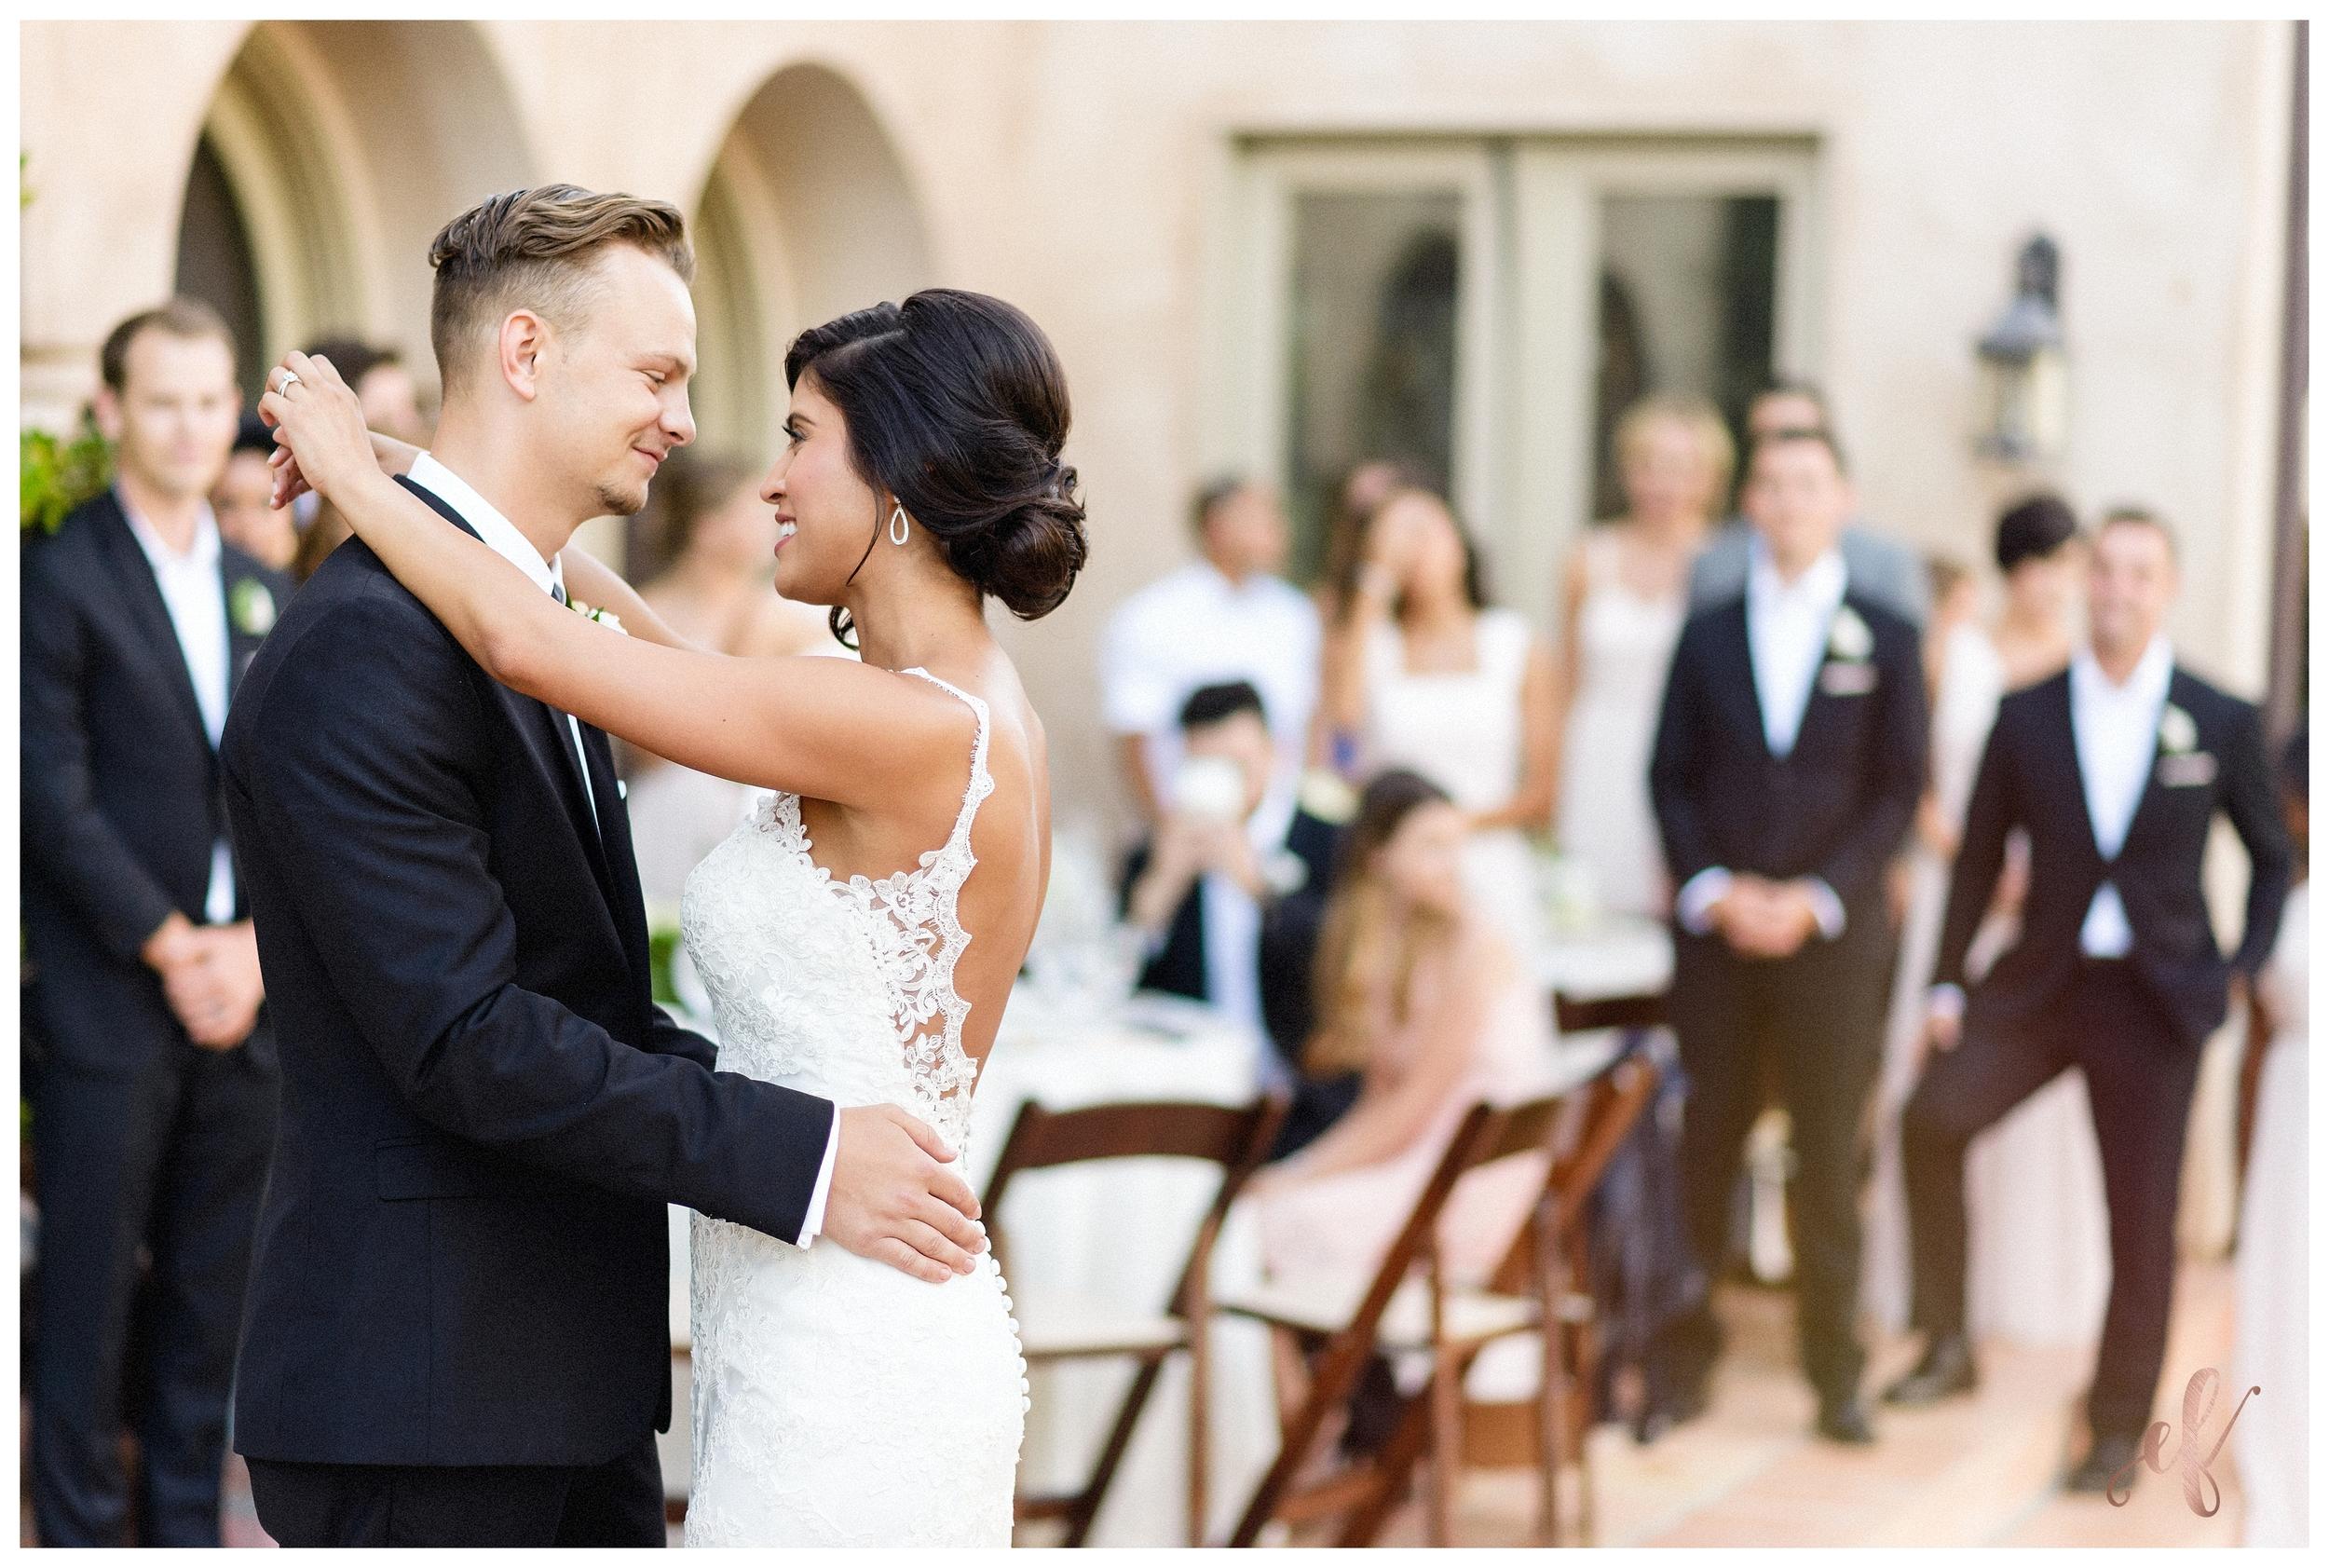 San Diego Wedding Photographer   Ernie & Fiona Photography   Bride   Groom   First Dance